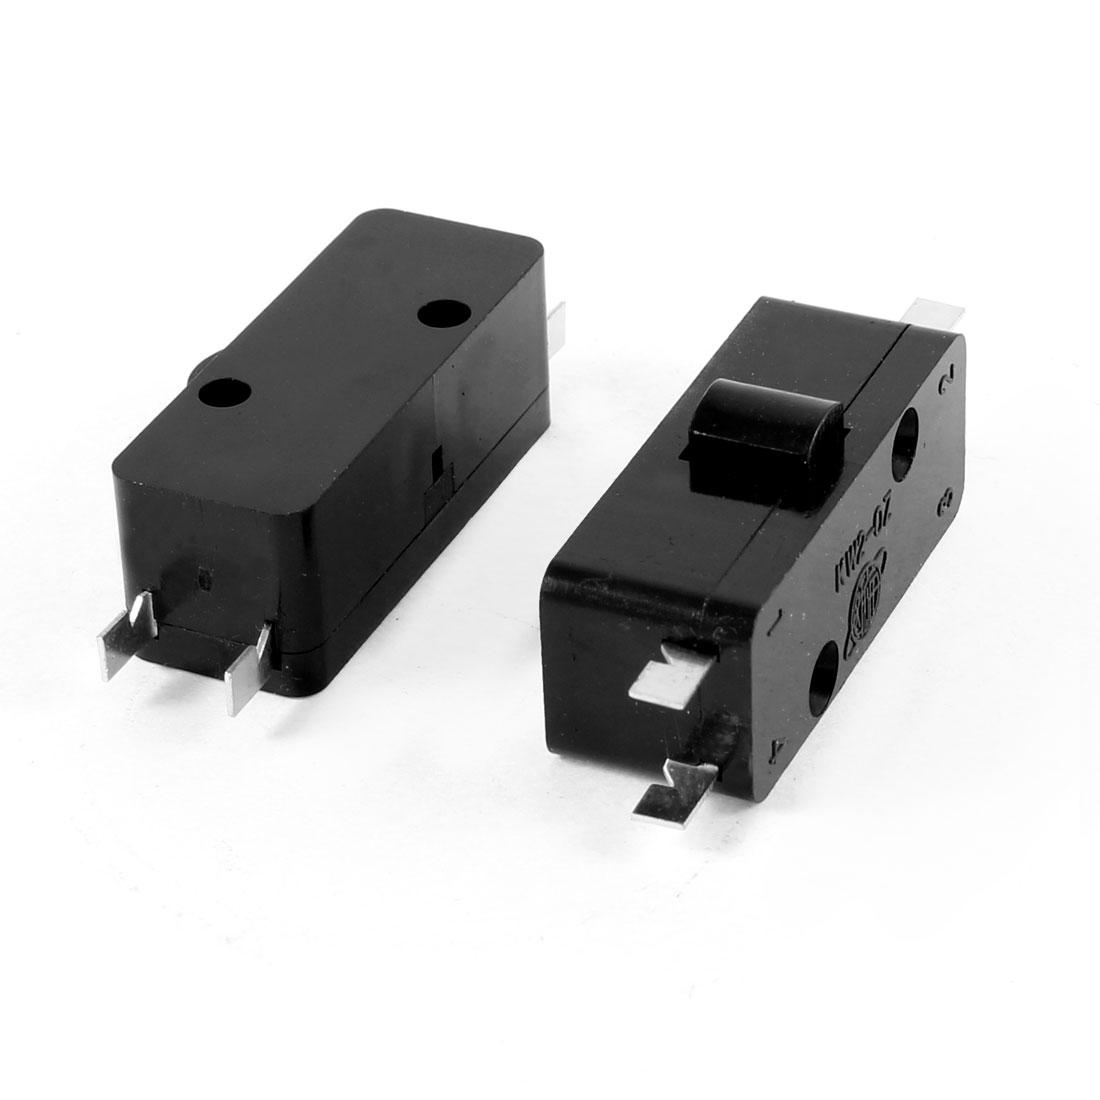 2 Pcs AC 250V/3A 125V/5A SPDT 4-Pin Push Button Actuator Mini Micro Switch